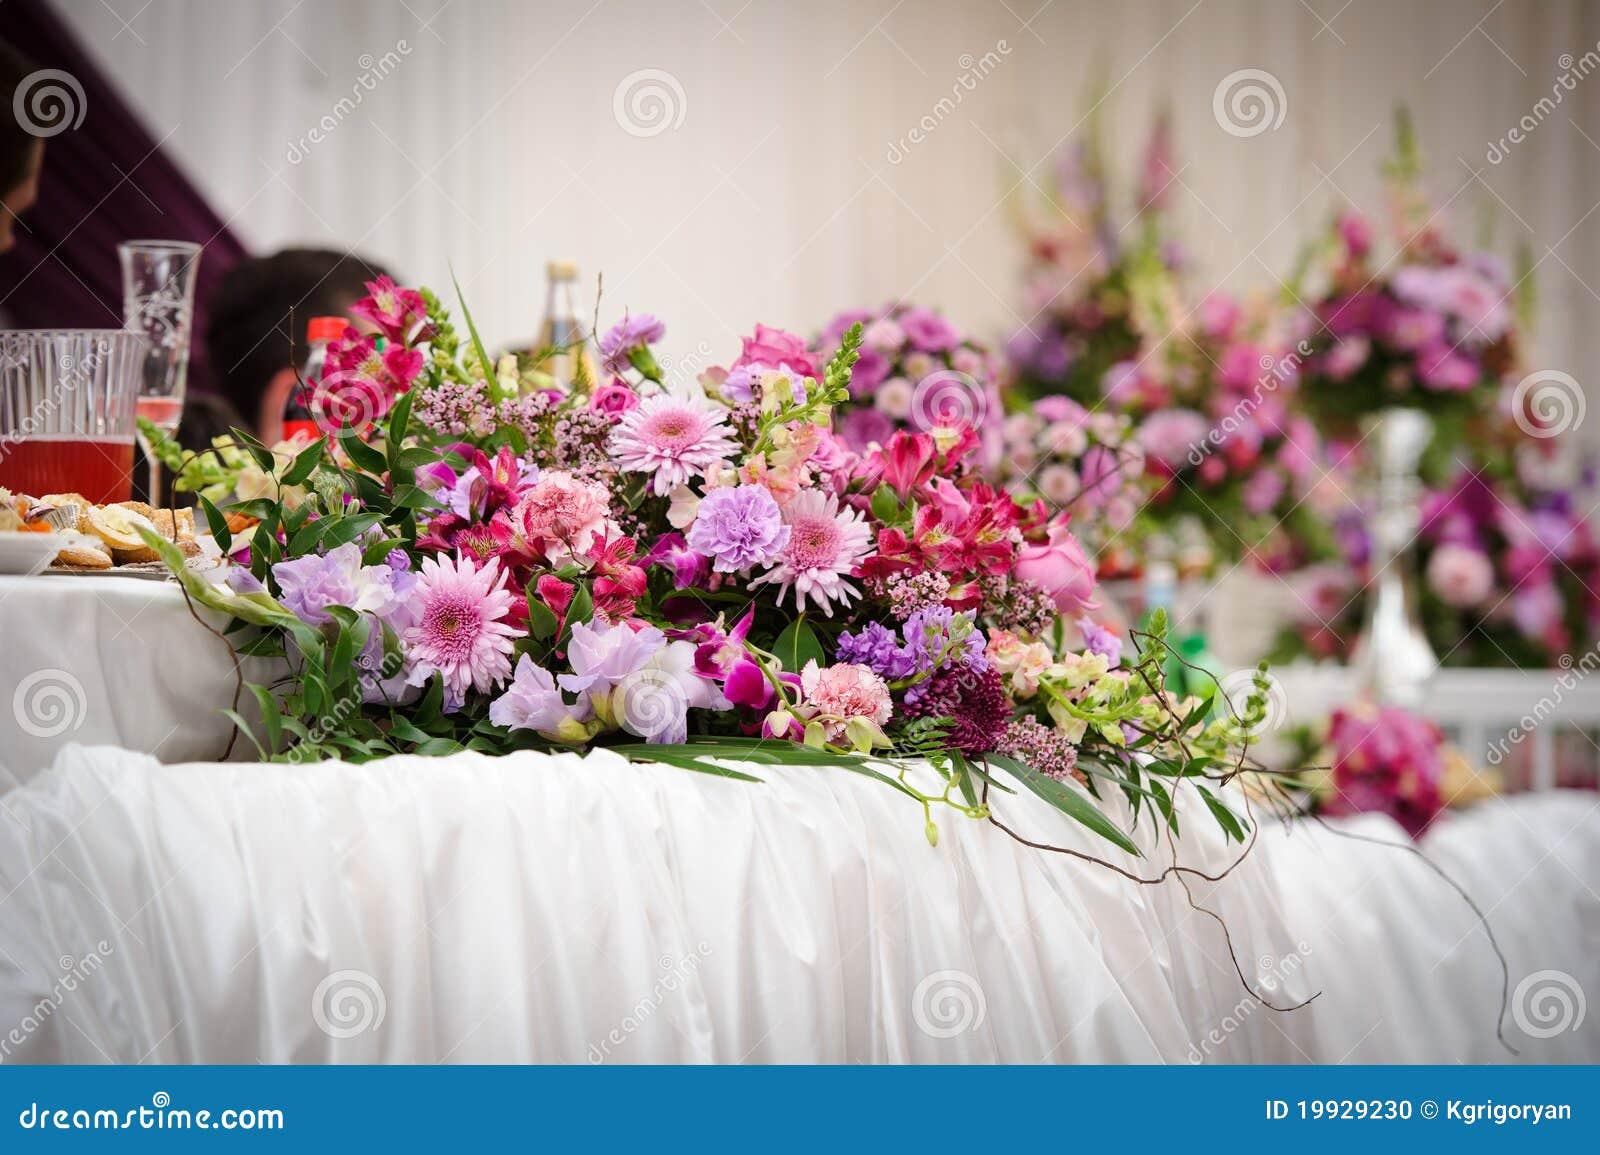 Wedding Table Flower Decoration Stock Photo Image 19929230 : wedding table flower decoration 19929230 from dreamstime.com size 1300 x 955 jpeg 168kB